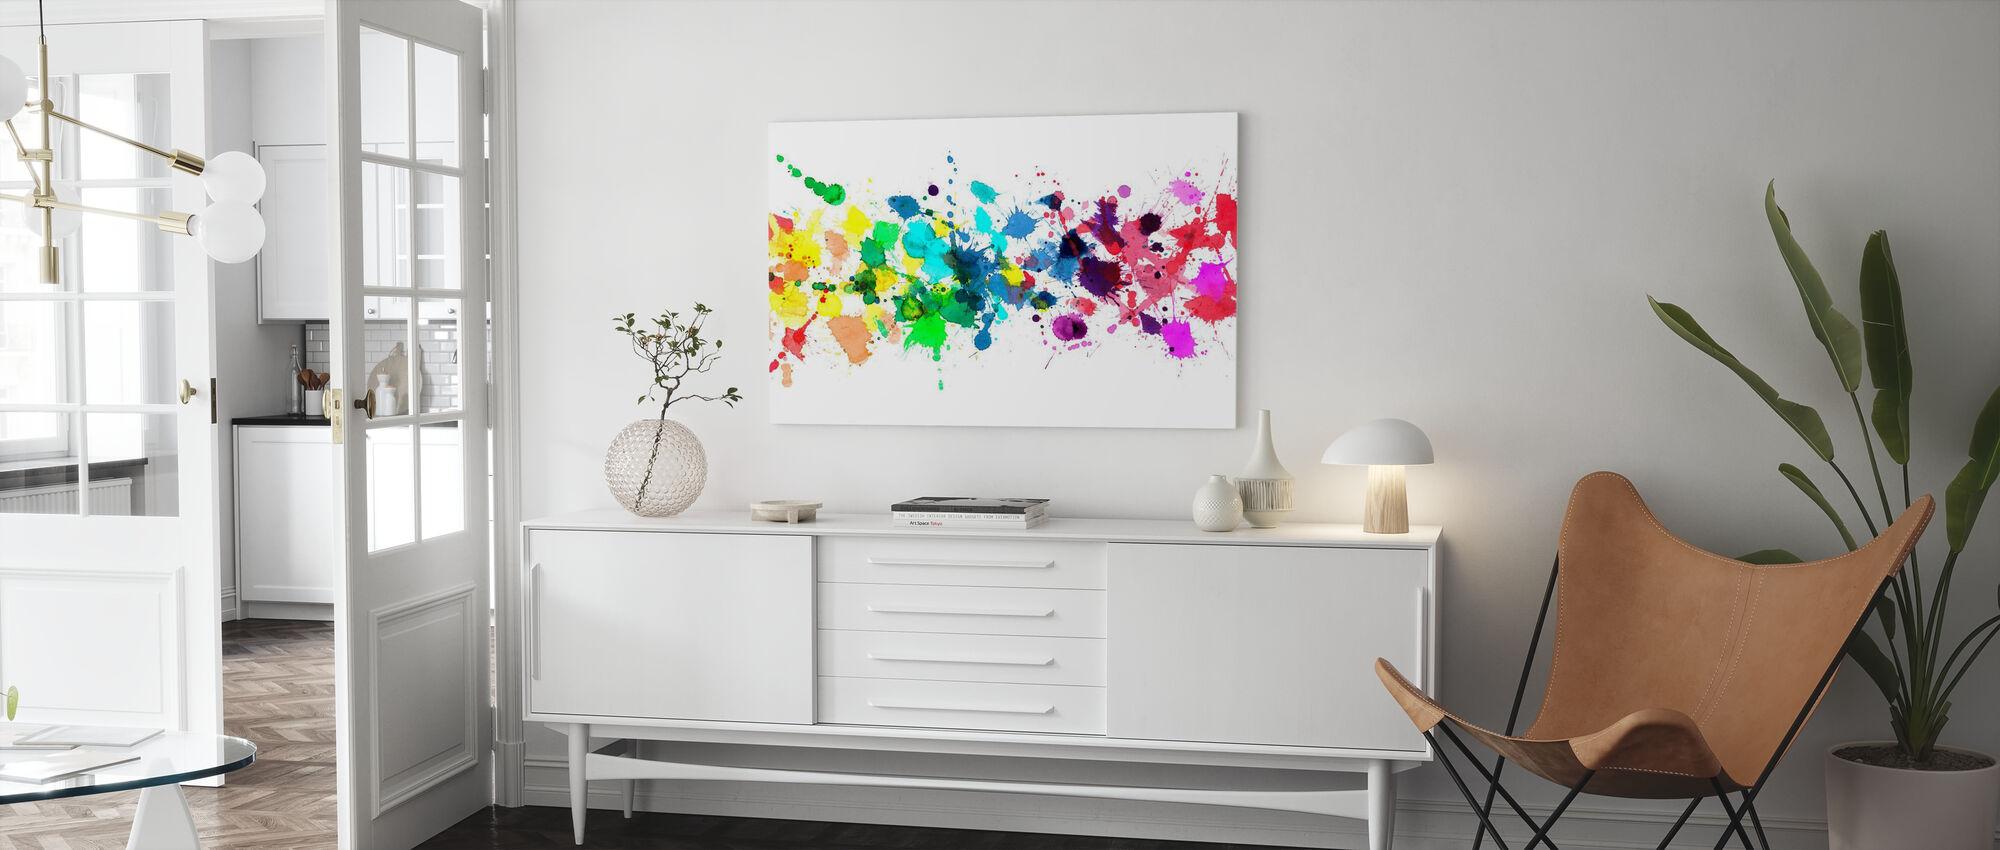 Watercolour Rainbow - Canvas print - Living Room